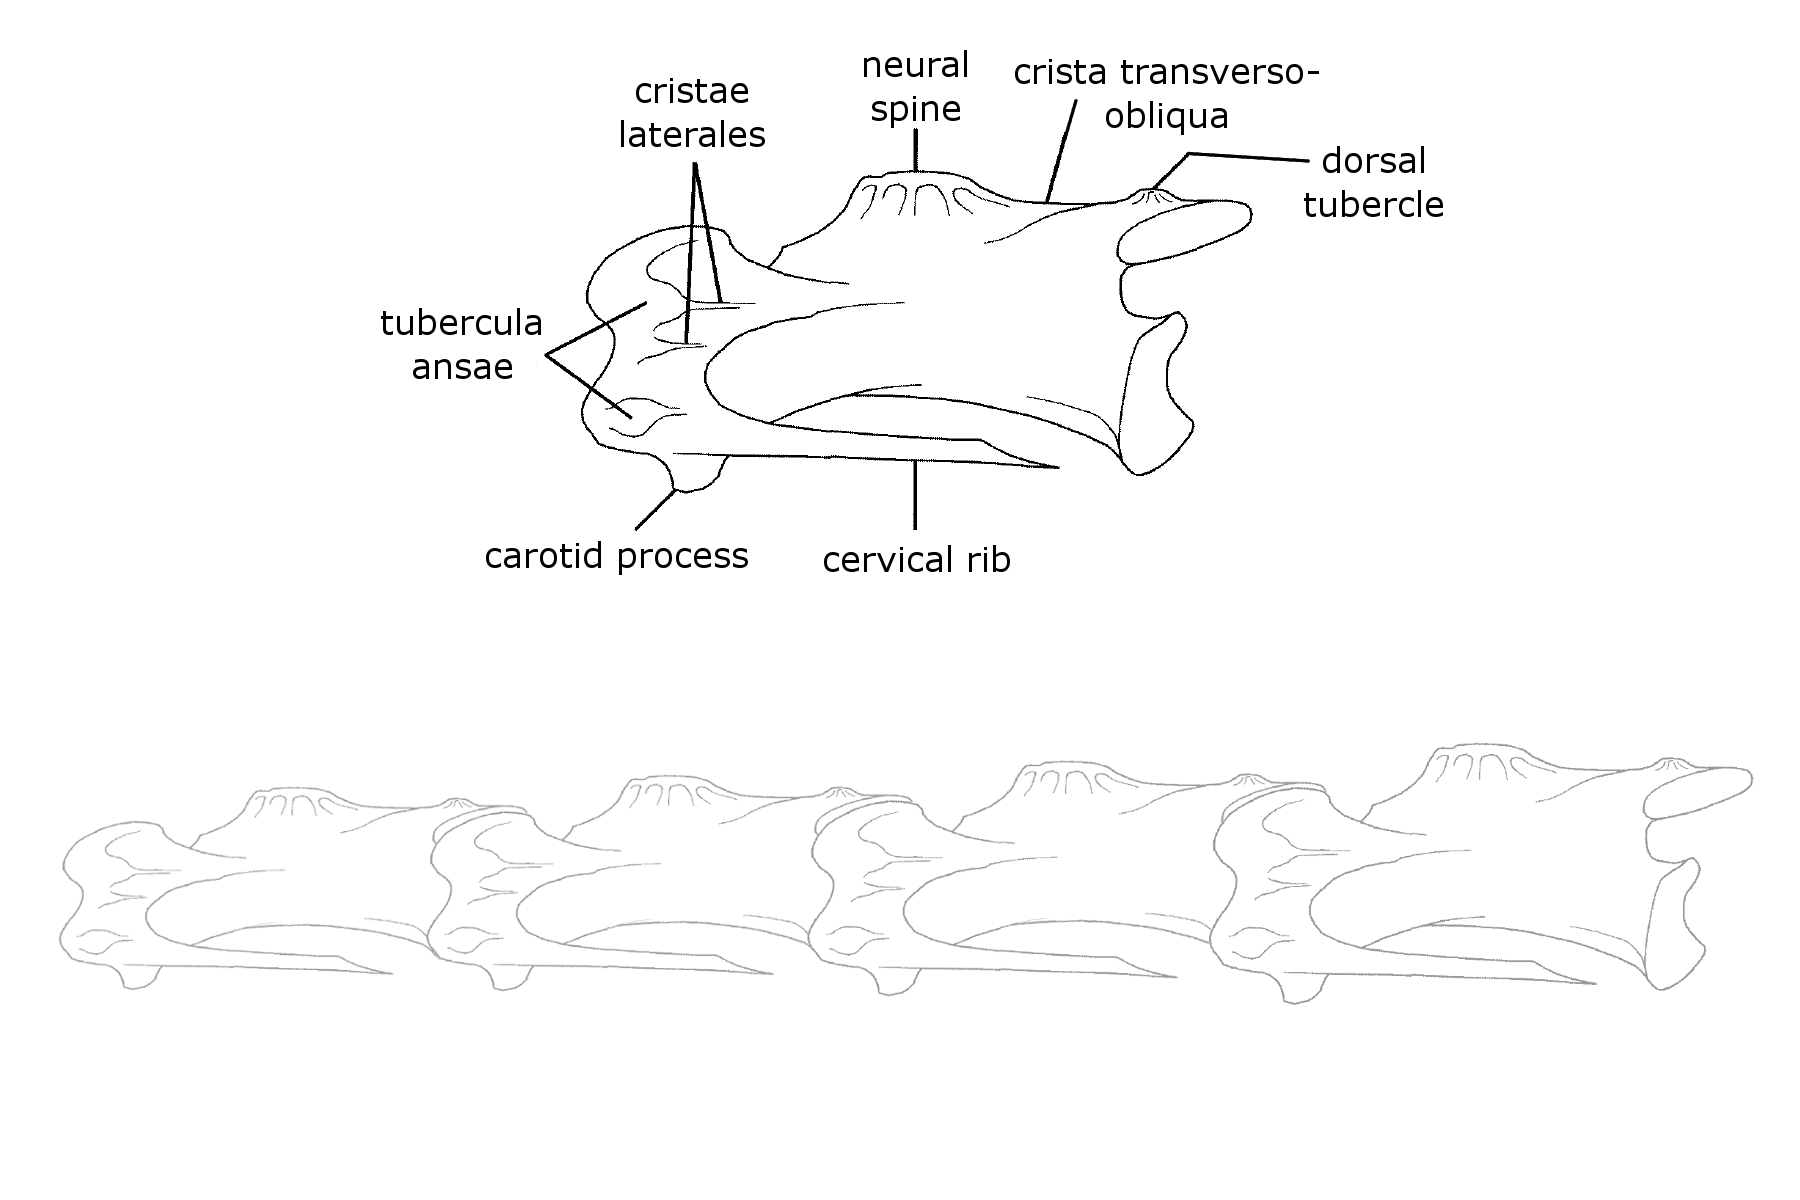 bird diagram unlabeled 1993 nissan 240sx wiring vertebra diagrams sauropod picture of the week